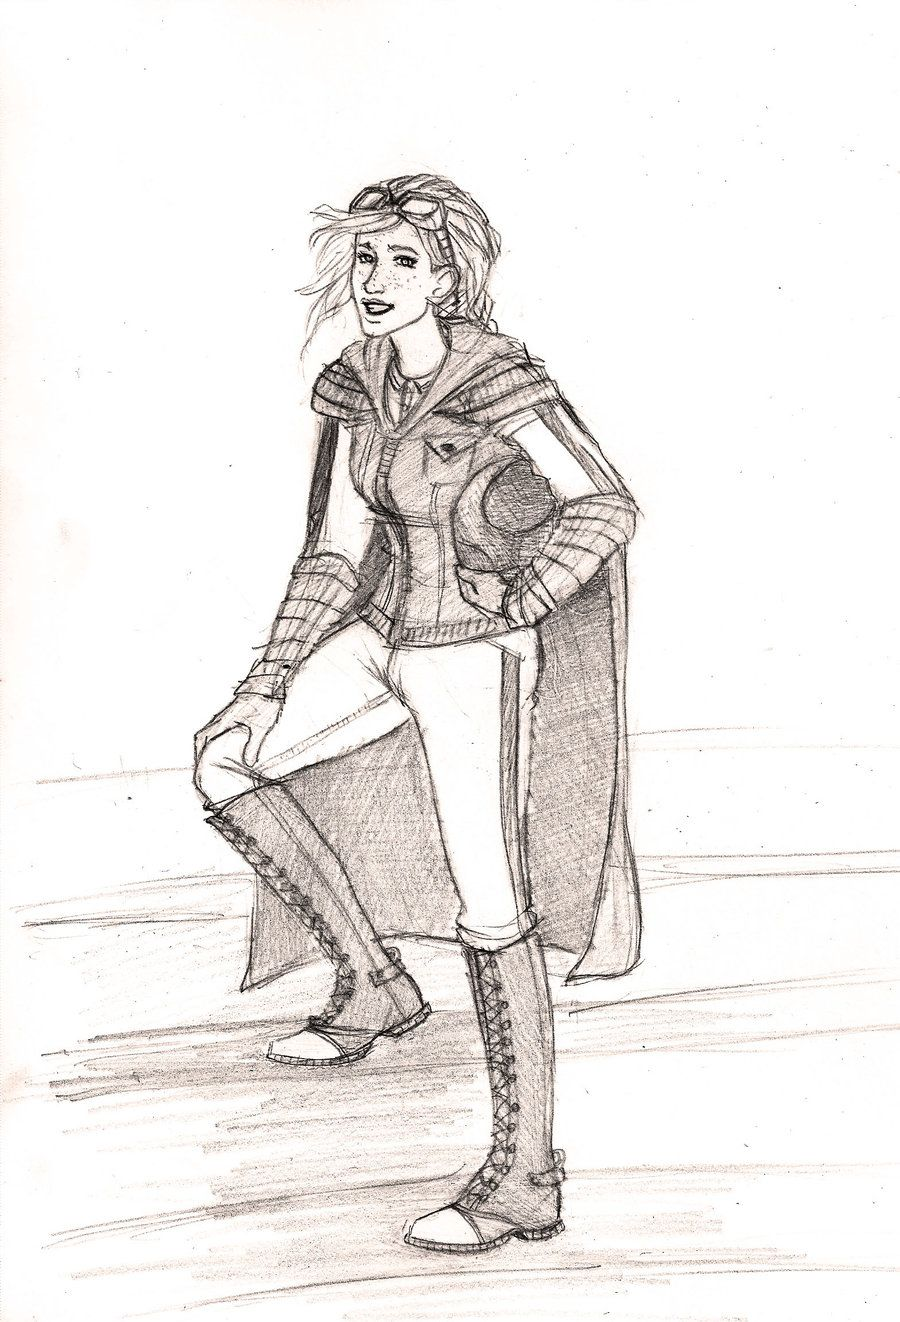 Holyhead Harpies: Ginny Weasley by Catching-Smoke.deviantart.com on @deviantART